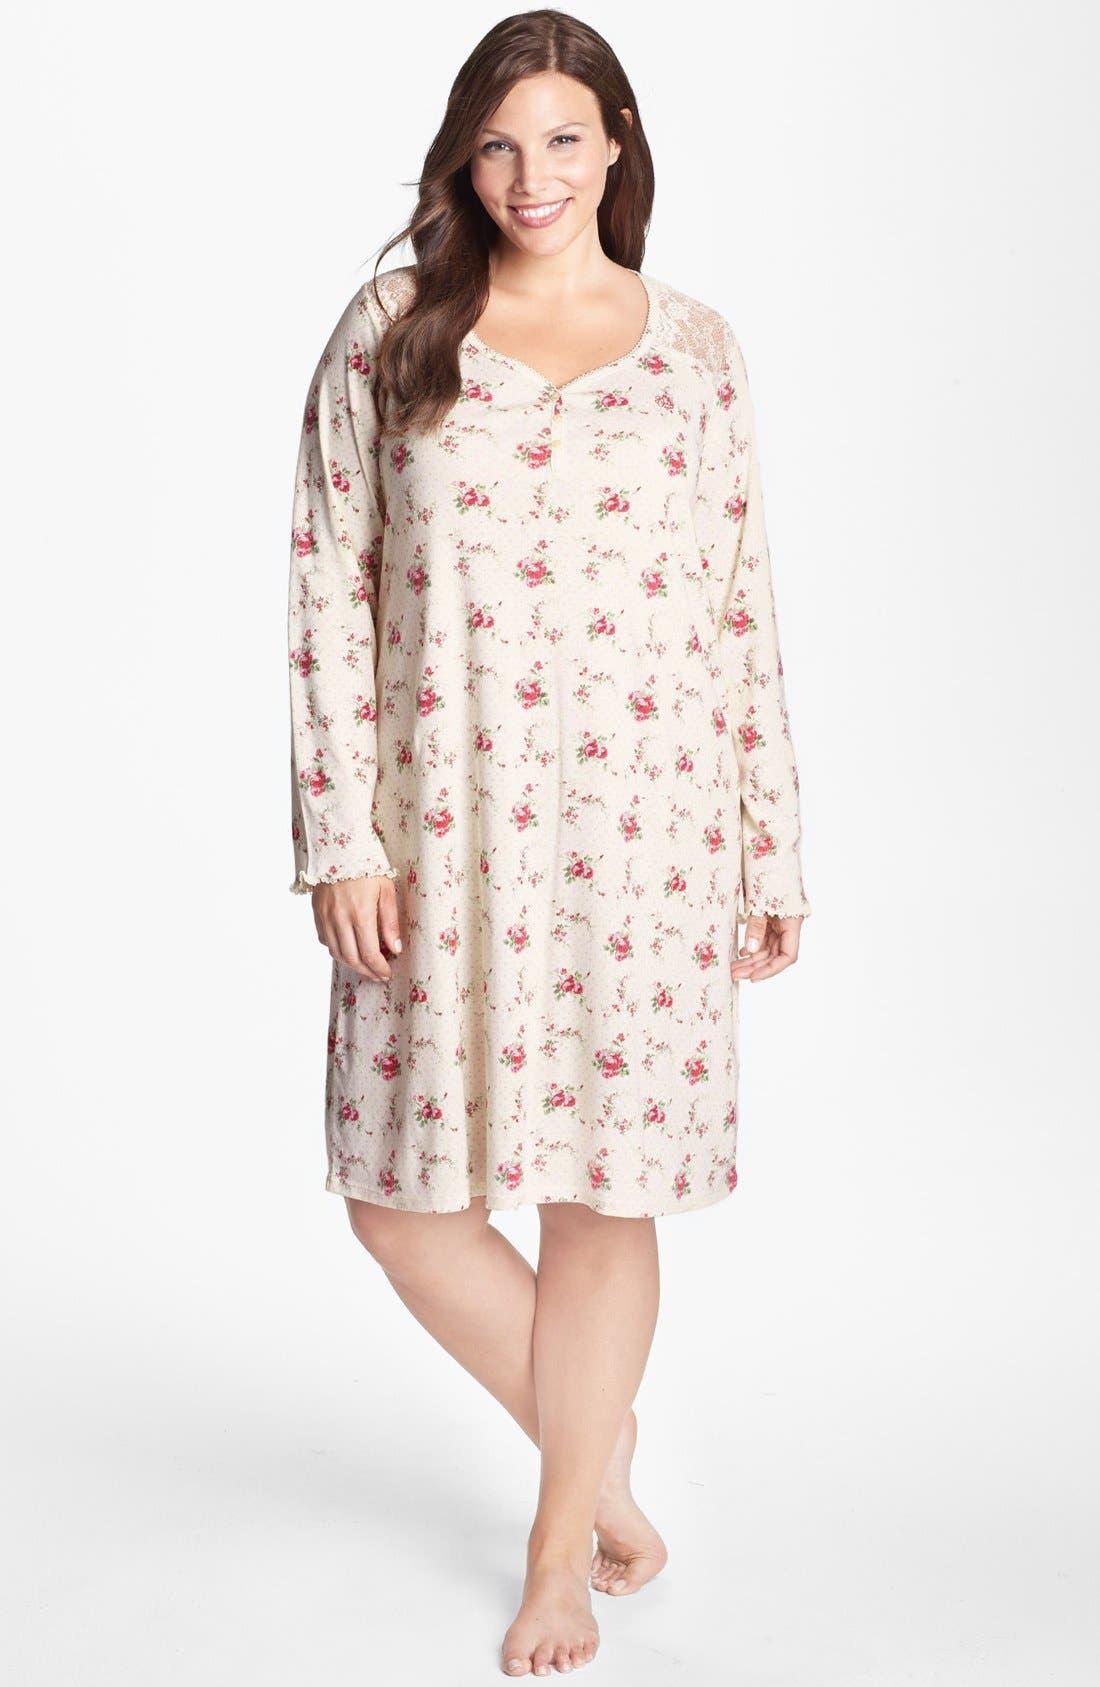 Main Image - Lauren Ralph Lauren Lace Trim Sleep Shirt (Plus Size)